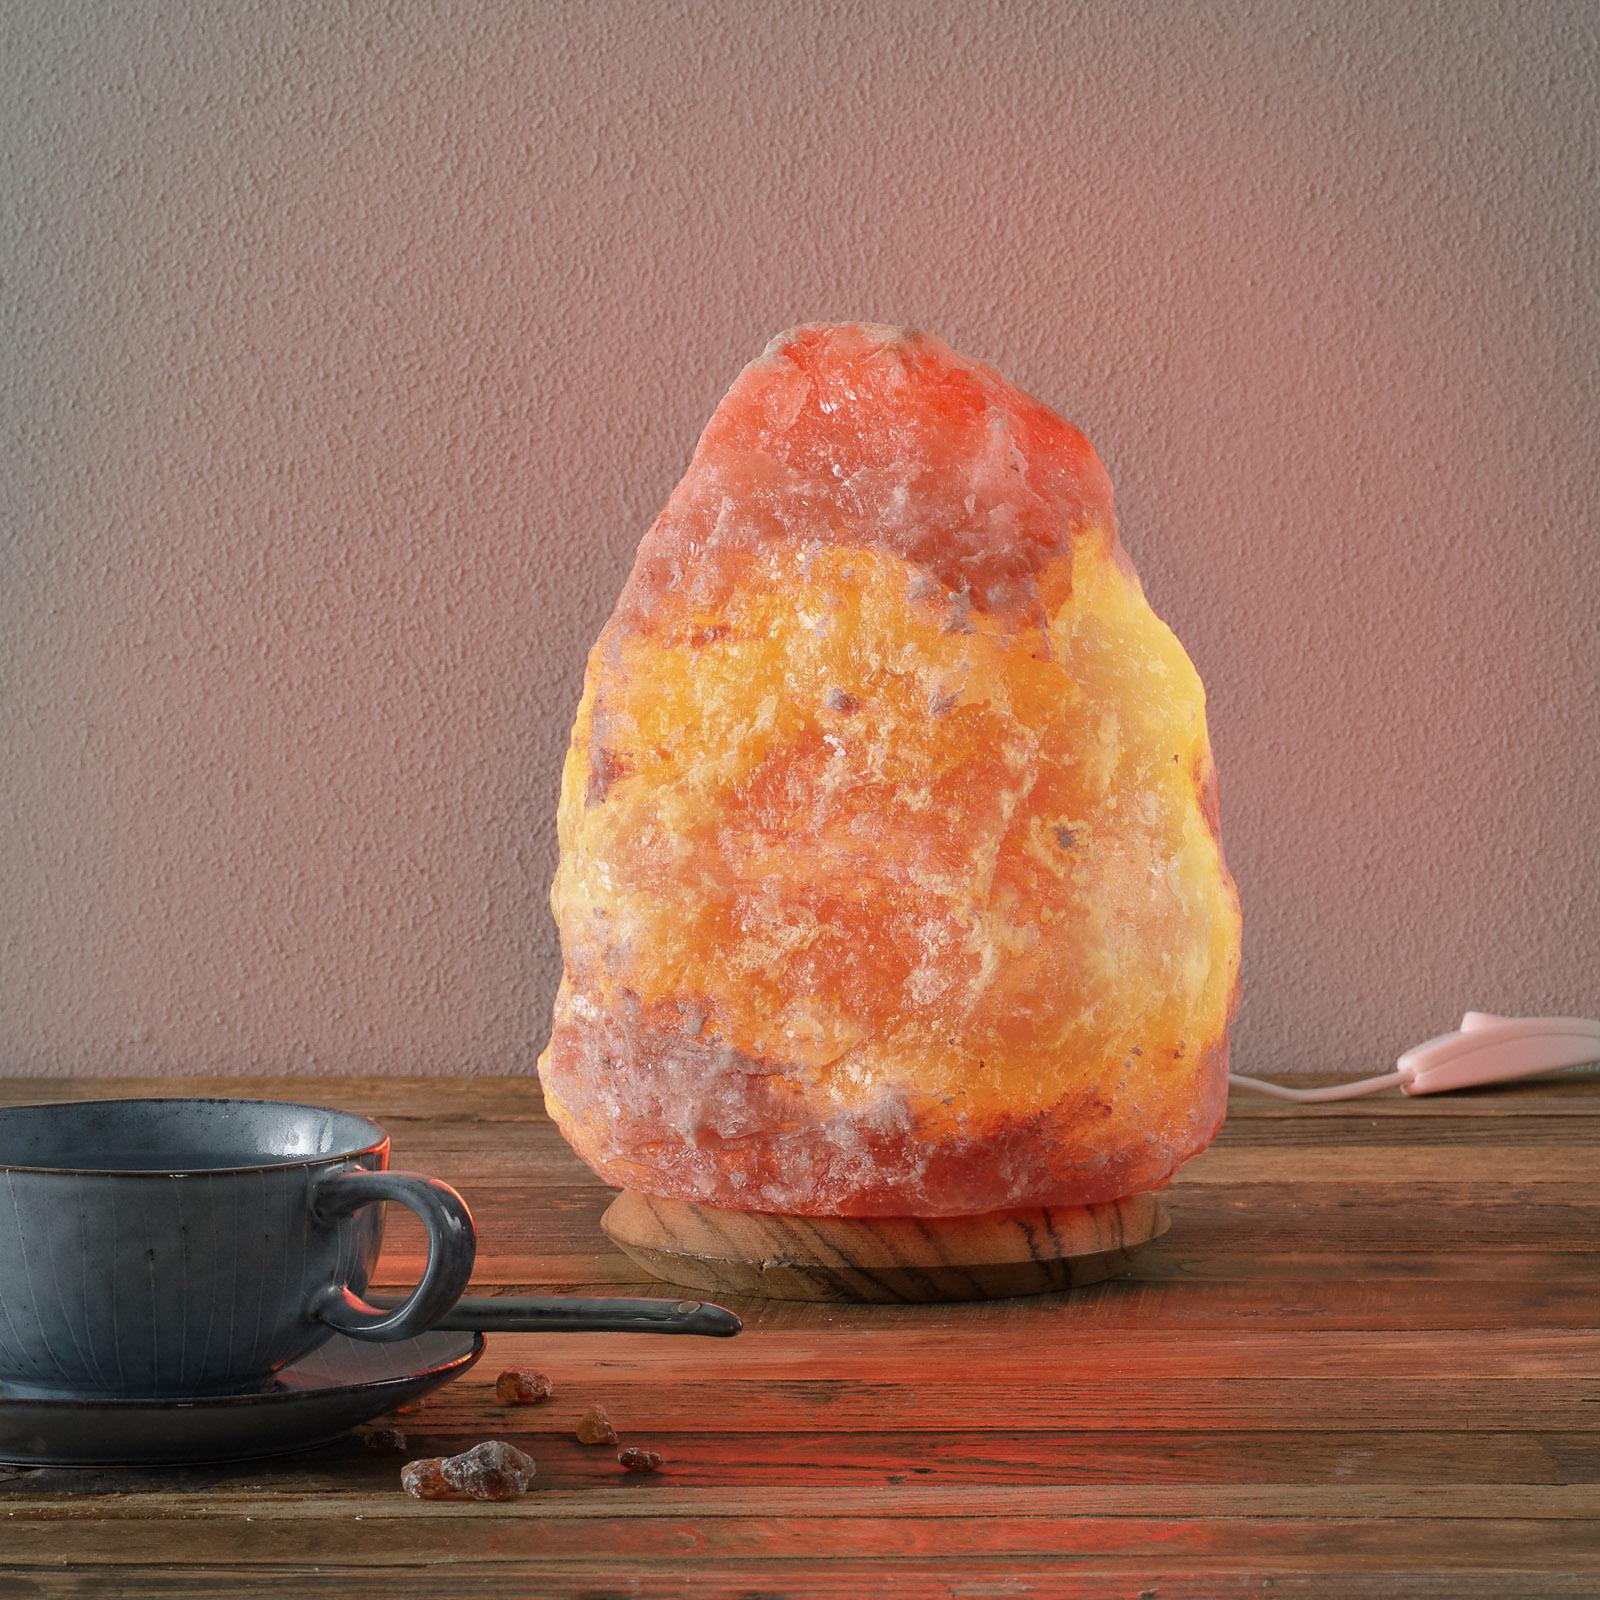 ROCK - Salzkristallleuchte 4-6 kg, Höhe ca. 23 cm